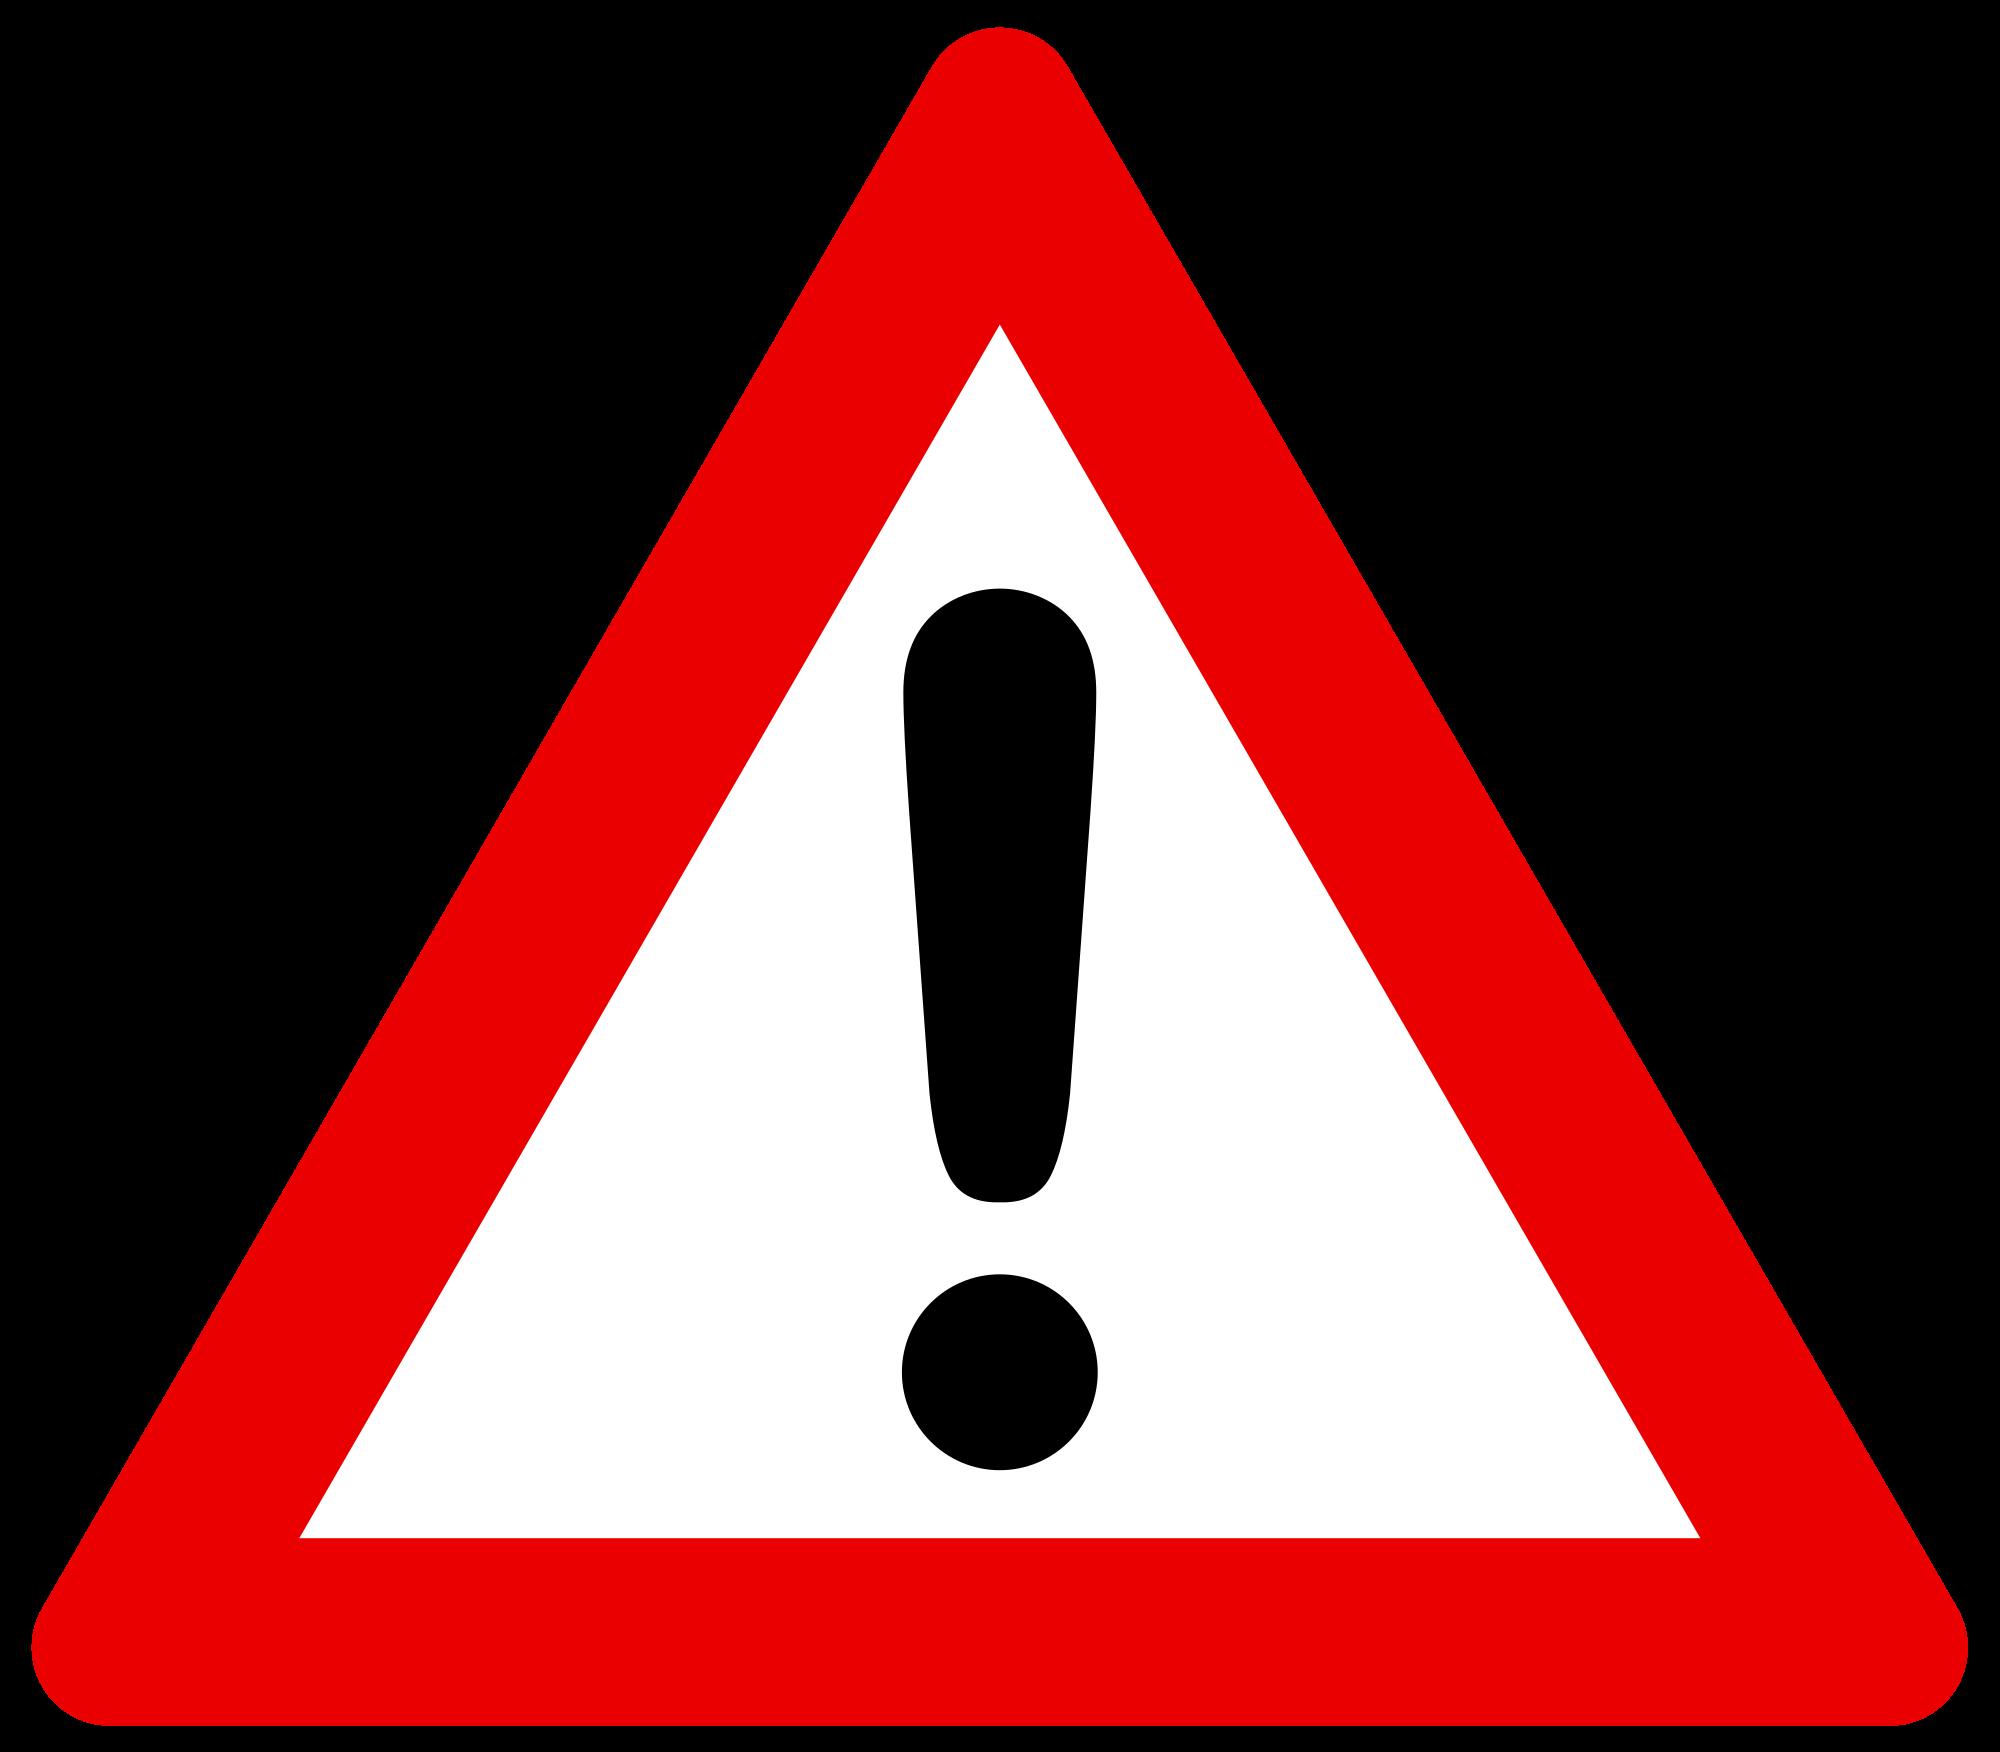 Emergency clipart dont panic. Sciblogs new zealanders prepare